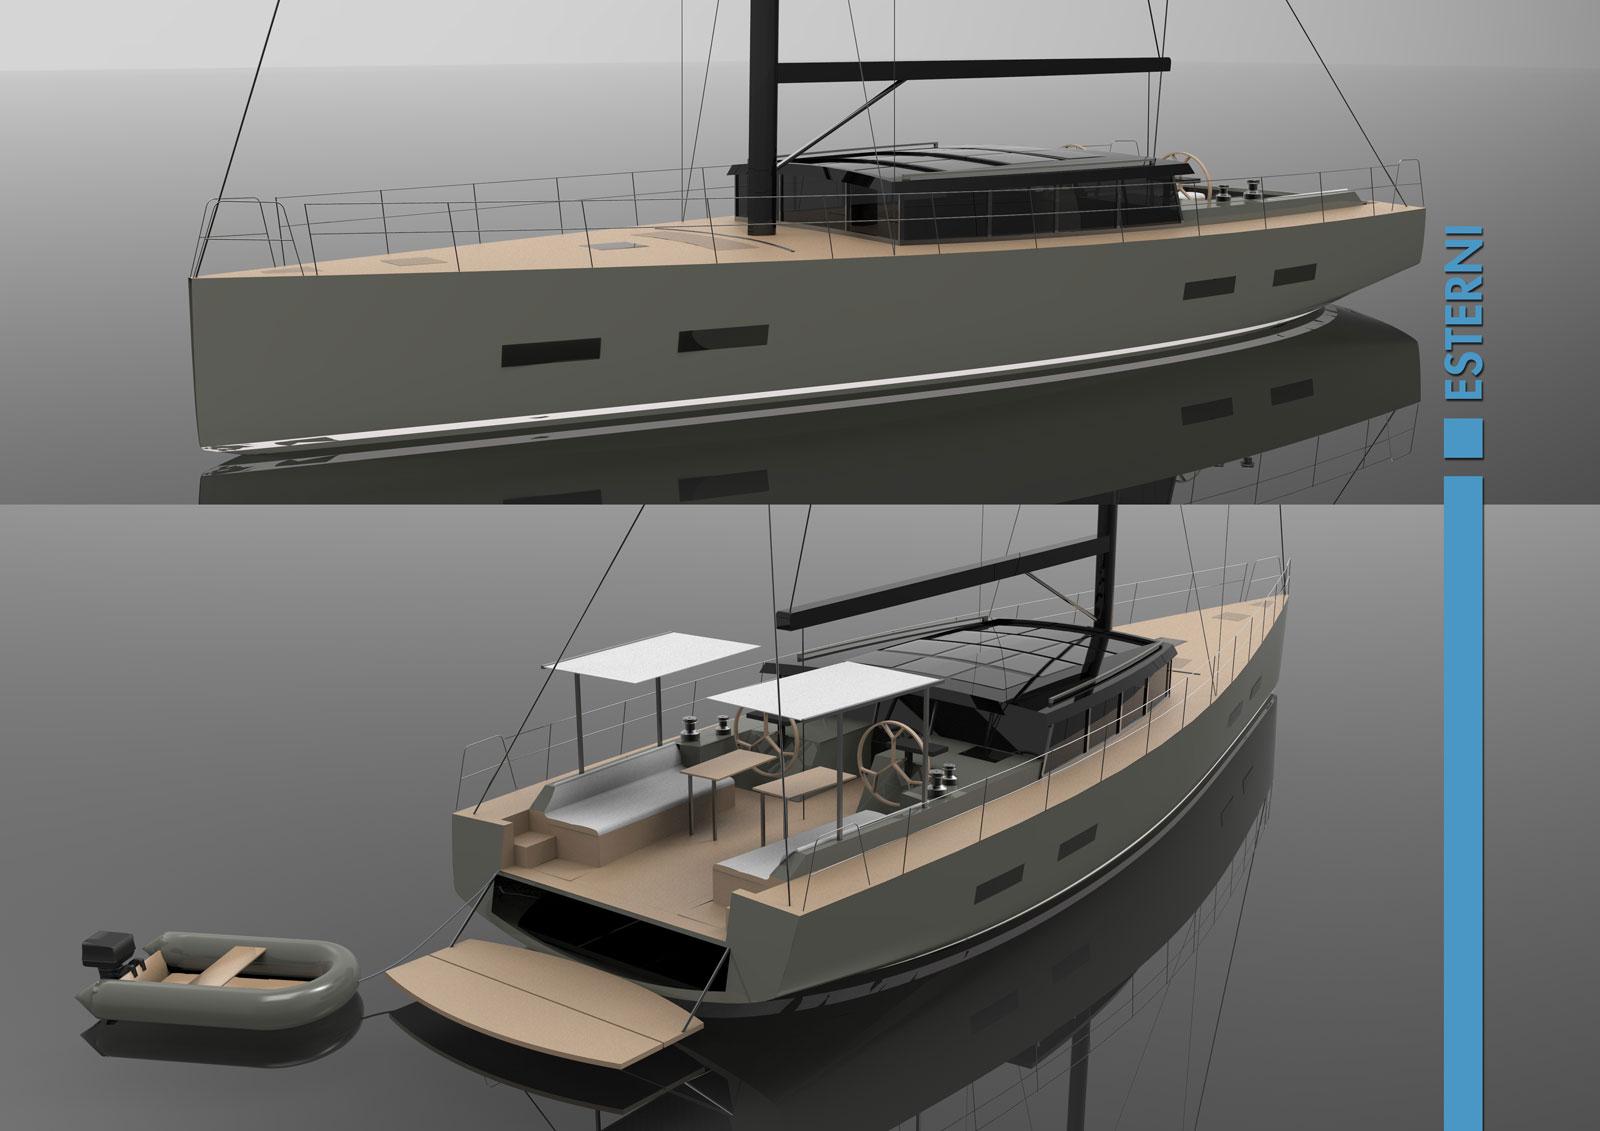 Tawhiri sailing boat concept by guido valtorta exterior for Yacht design milano